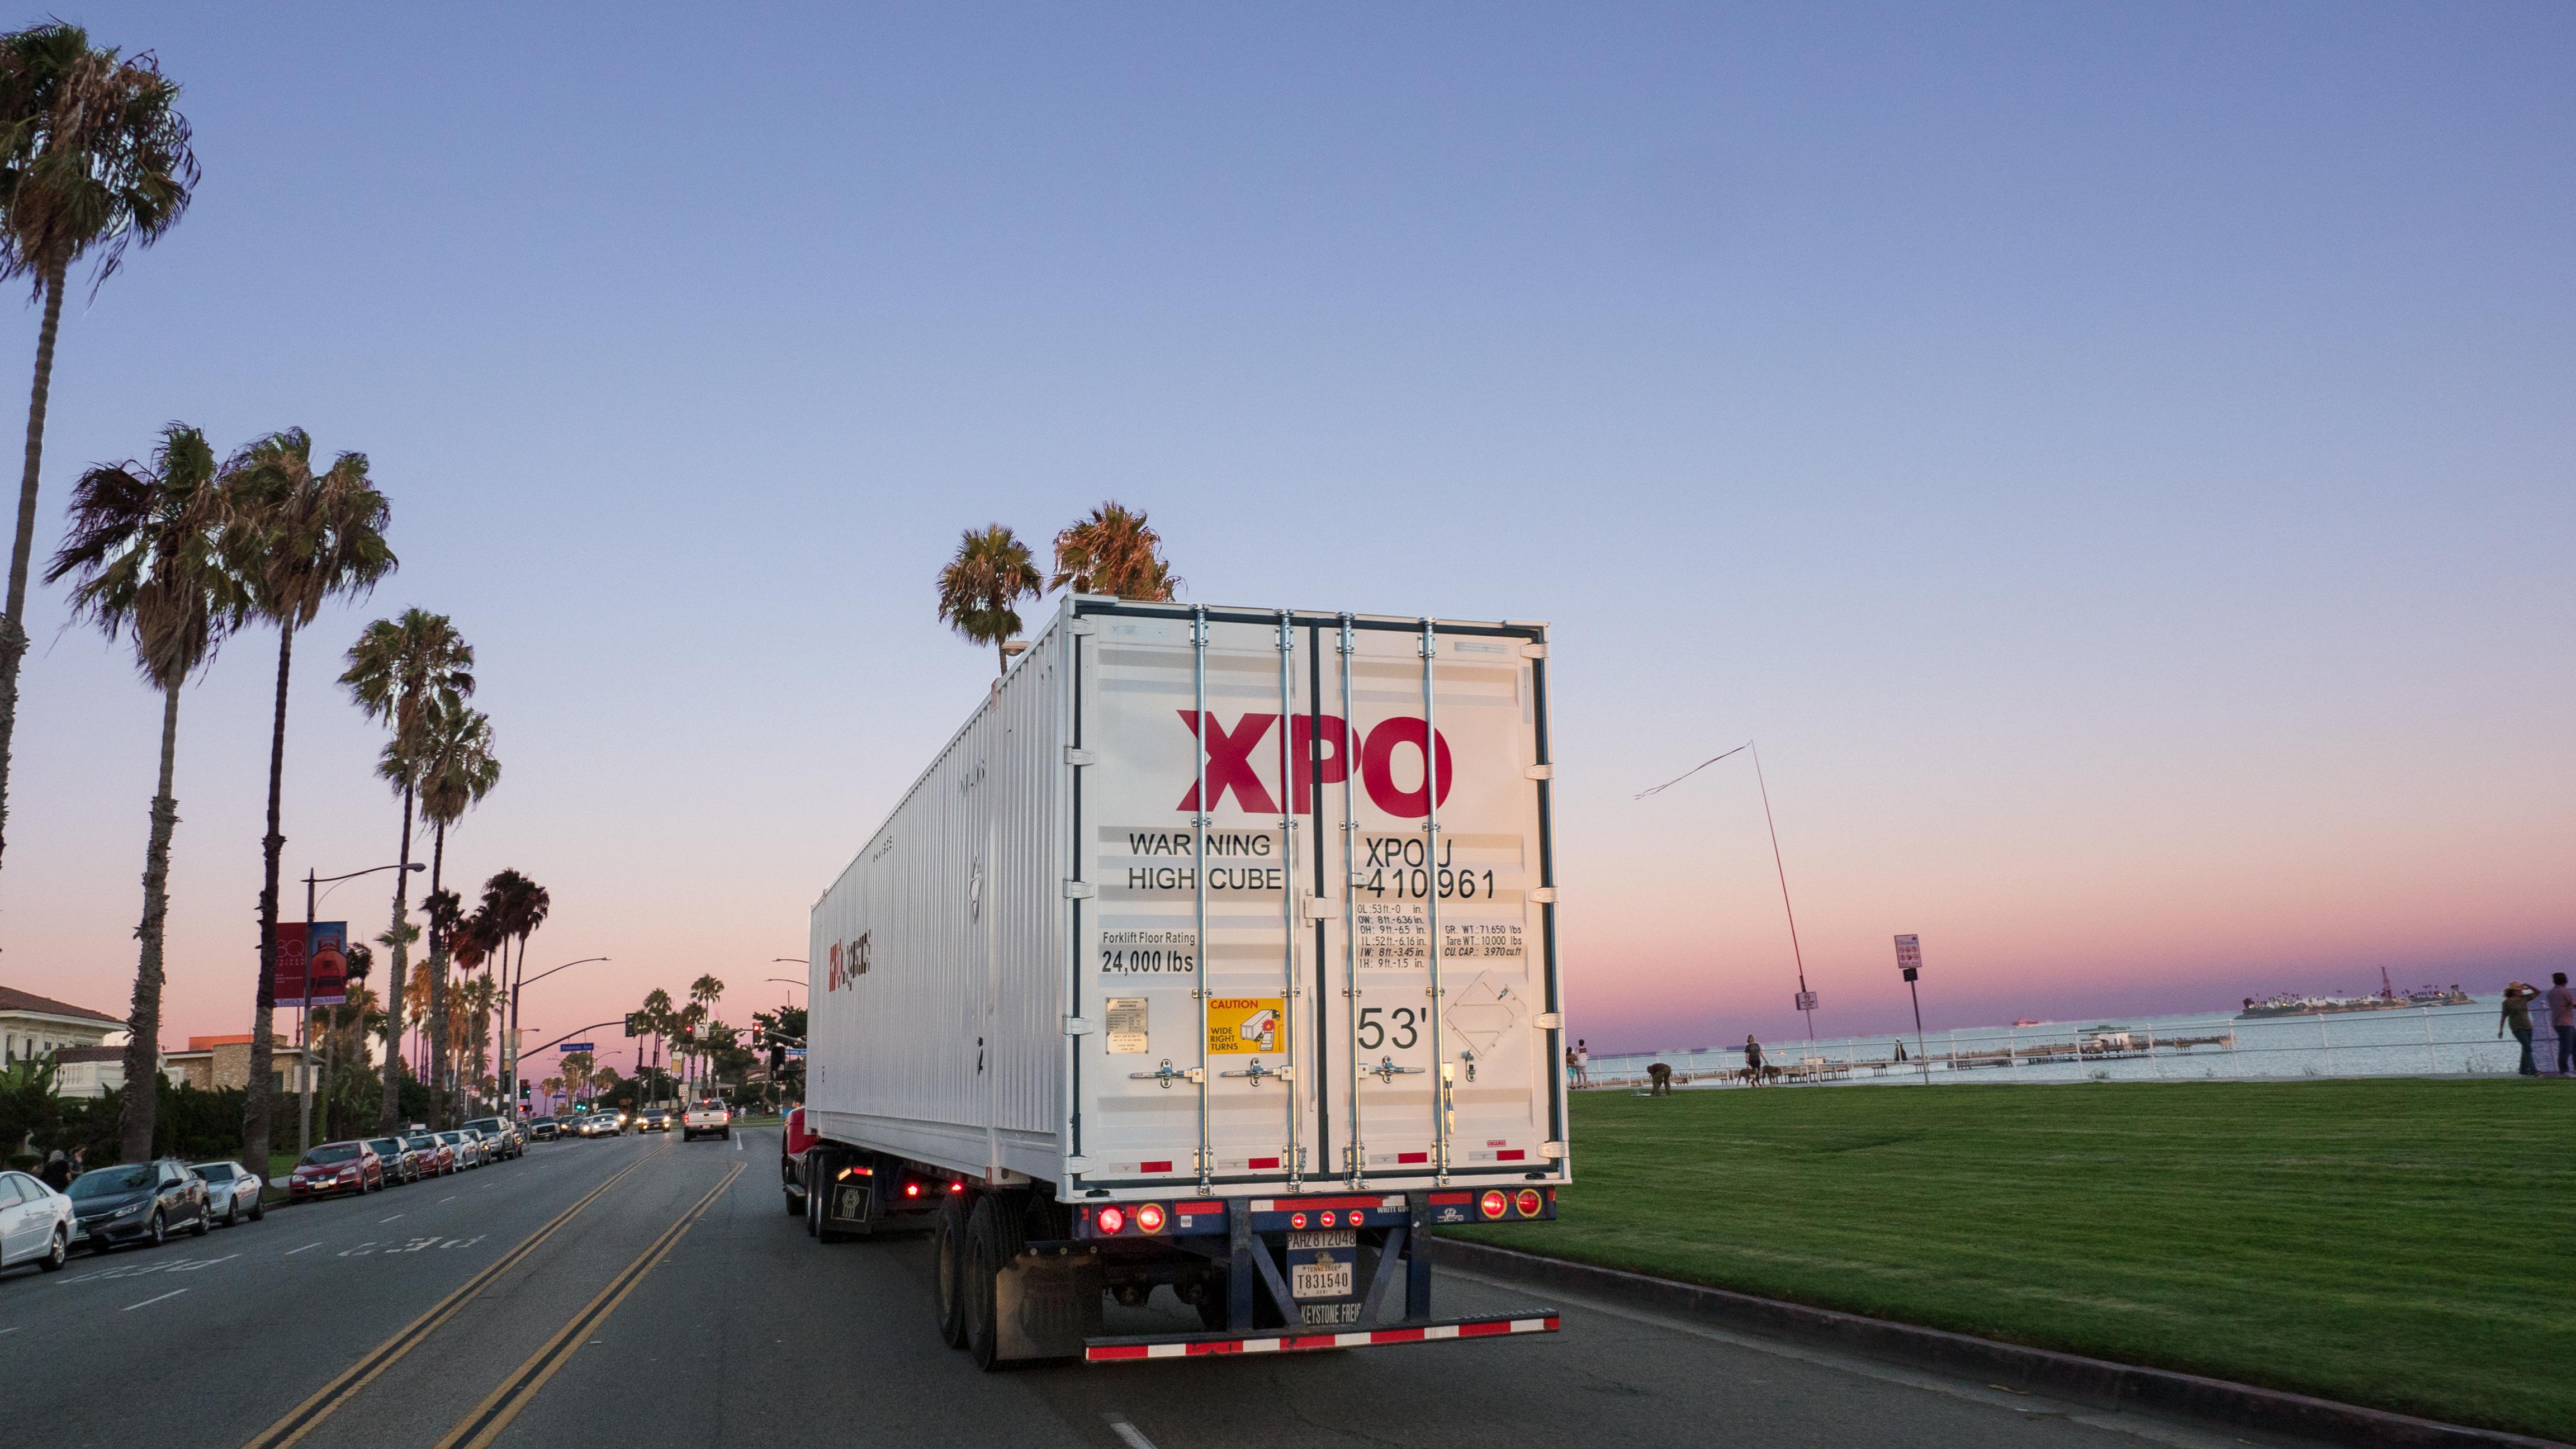 An XPO Logistics semitruck drives down a tropical highway.